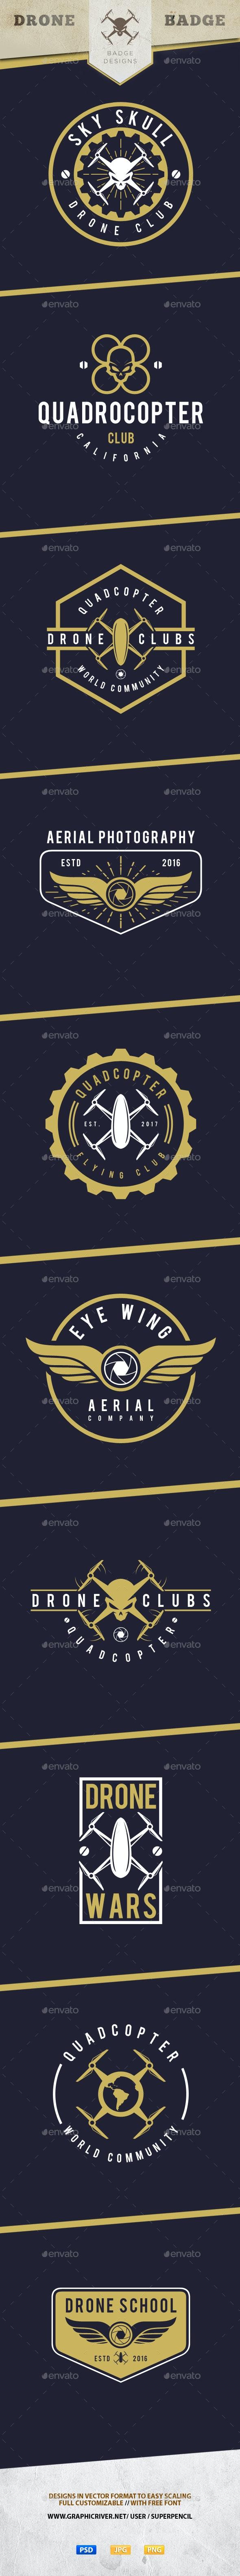 10 Drone Badges  - Badges & Stickers Web Elements